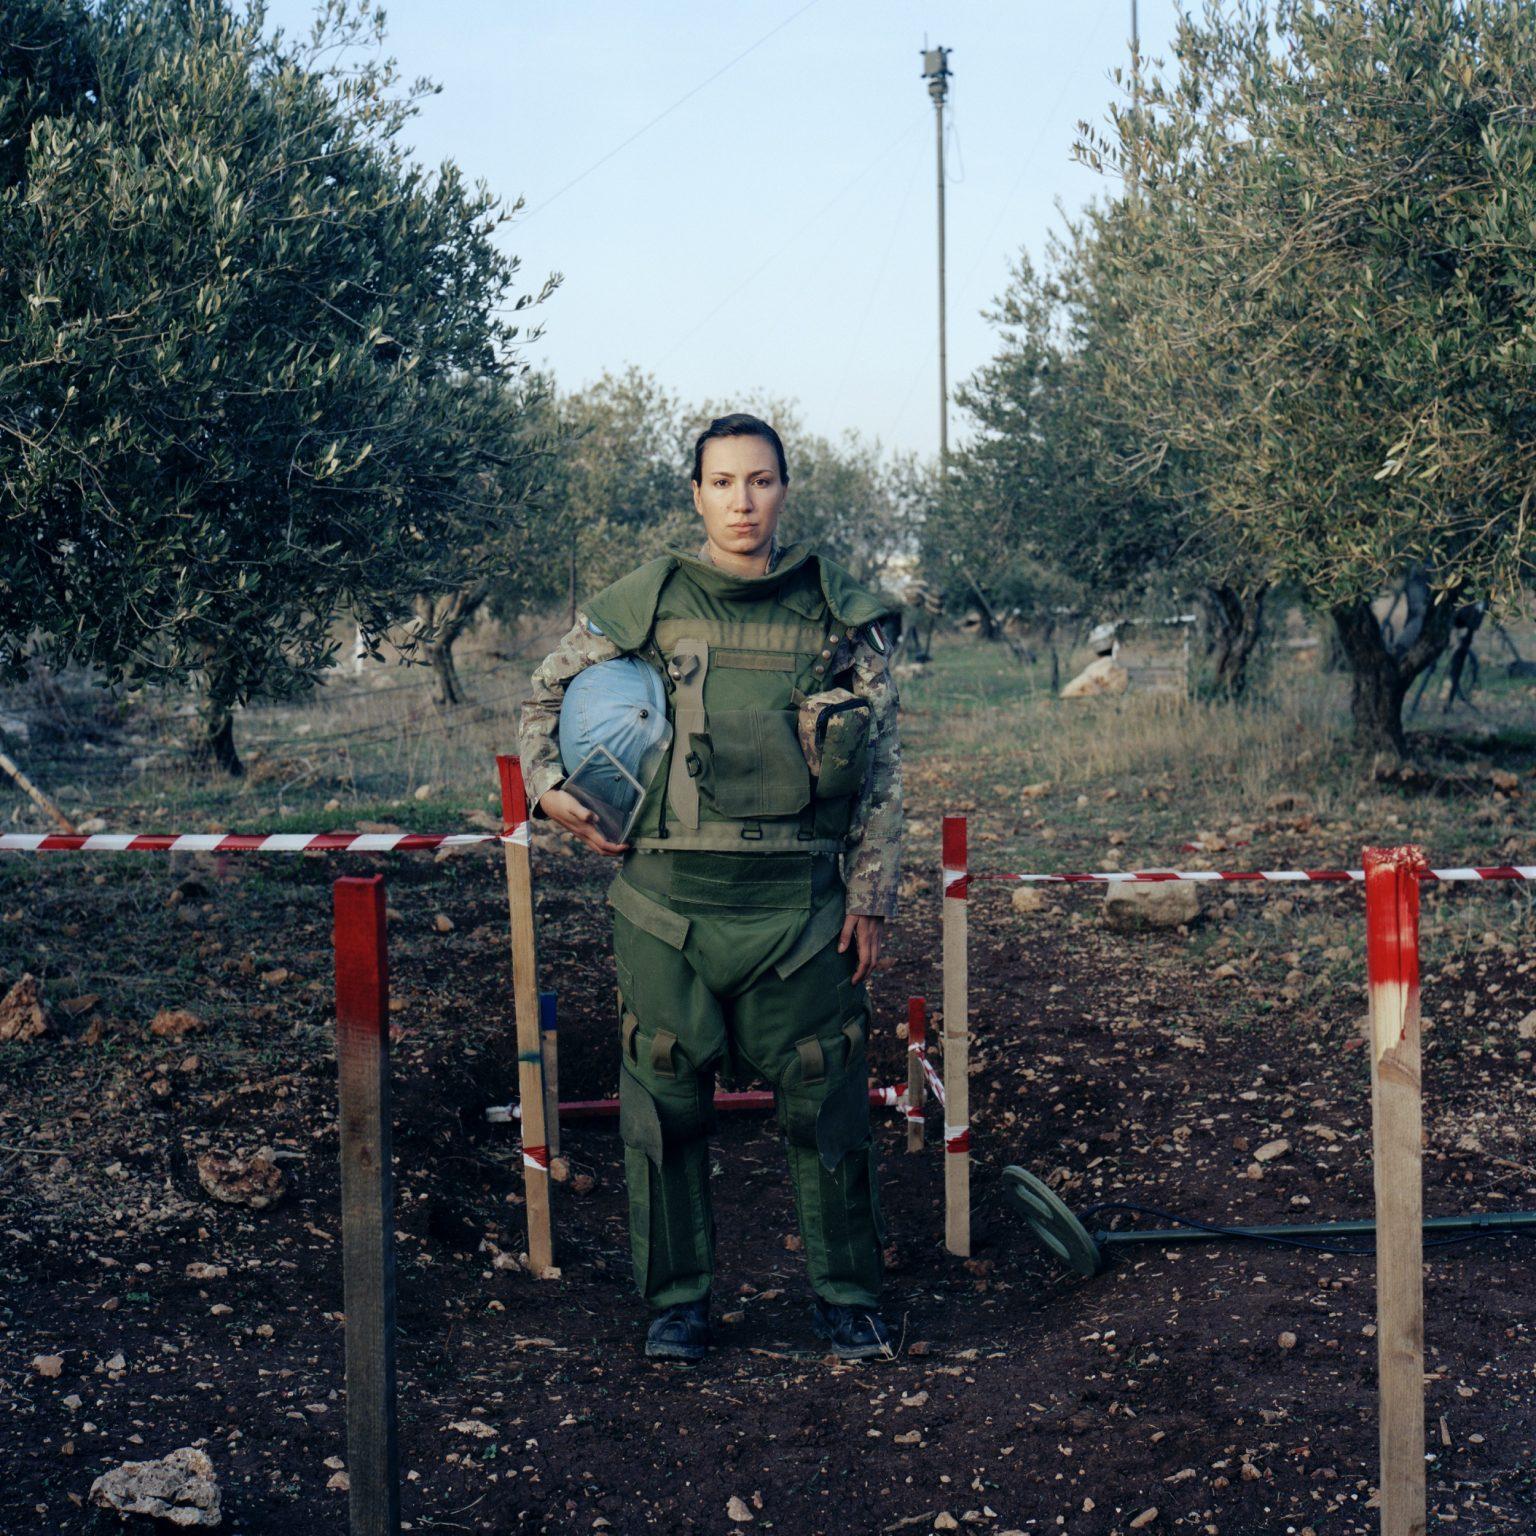 Chamaa, Lebanon. Main barracks of the UNIFIL Italian contingent. Senior CorporalGiovanna La Rosa, sapper, dressed with demining suit